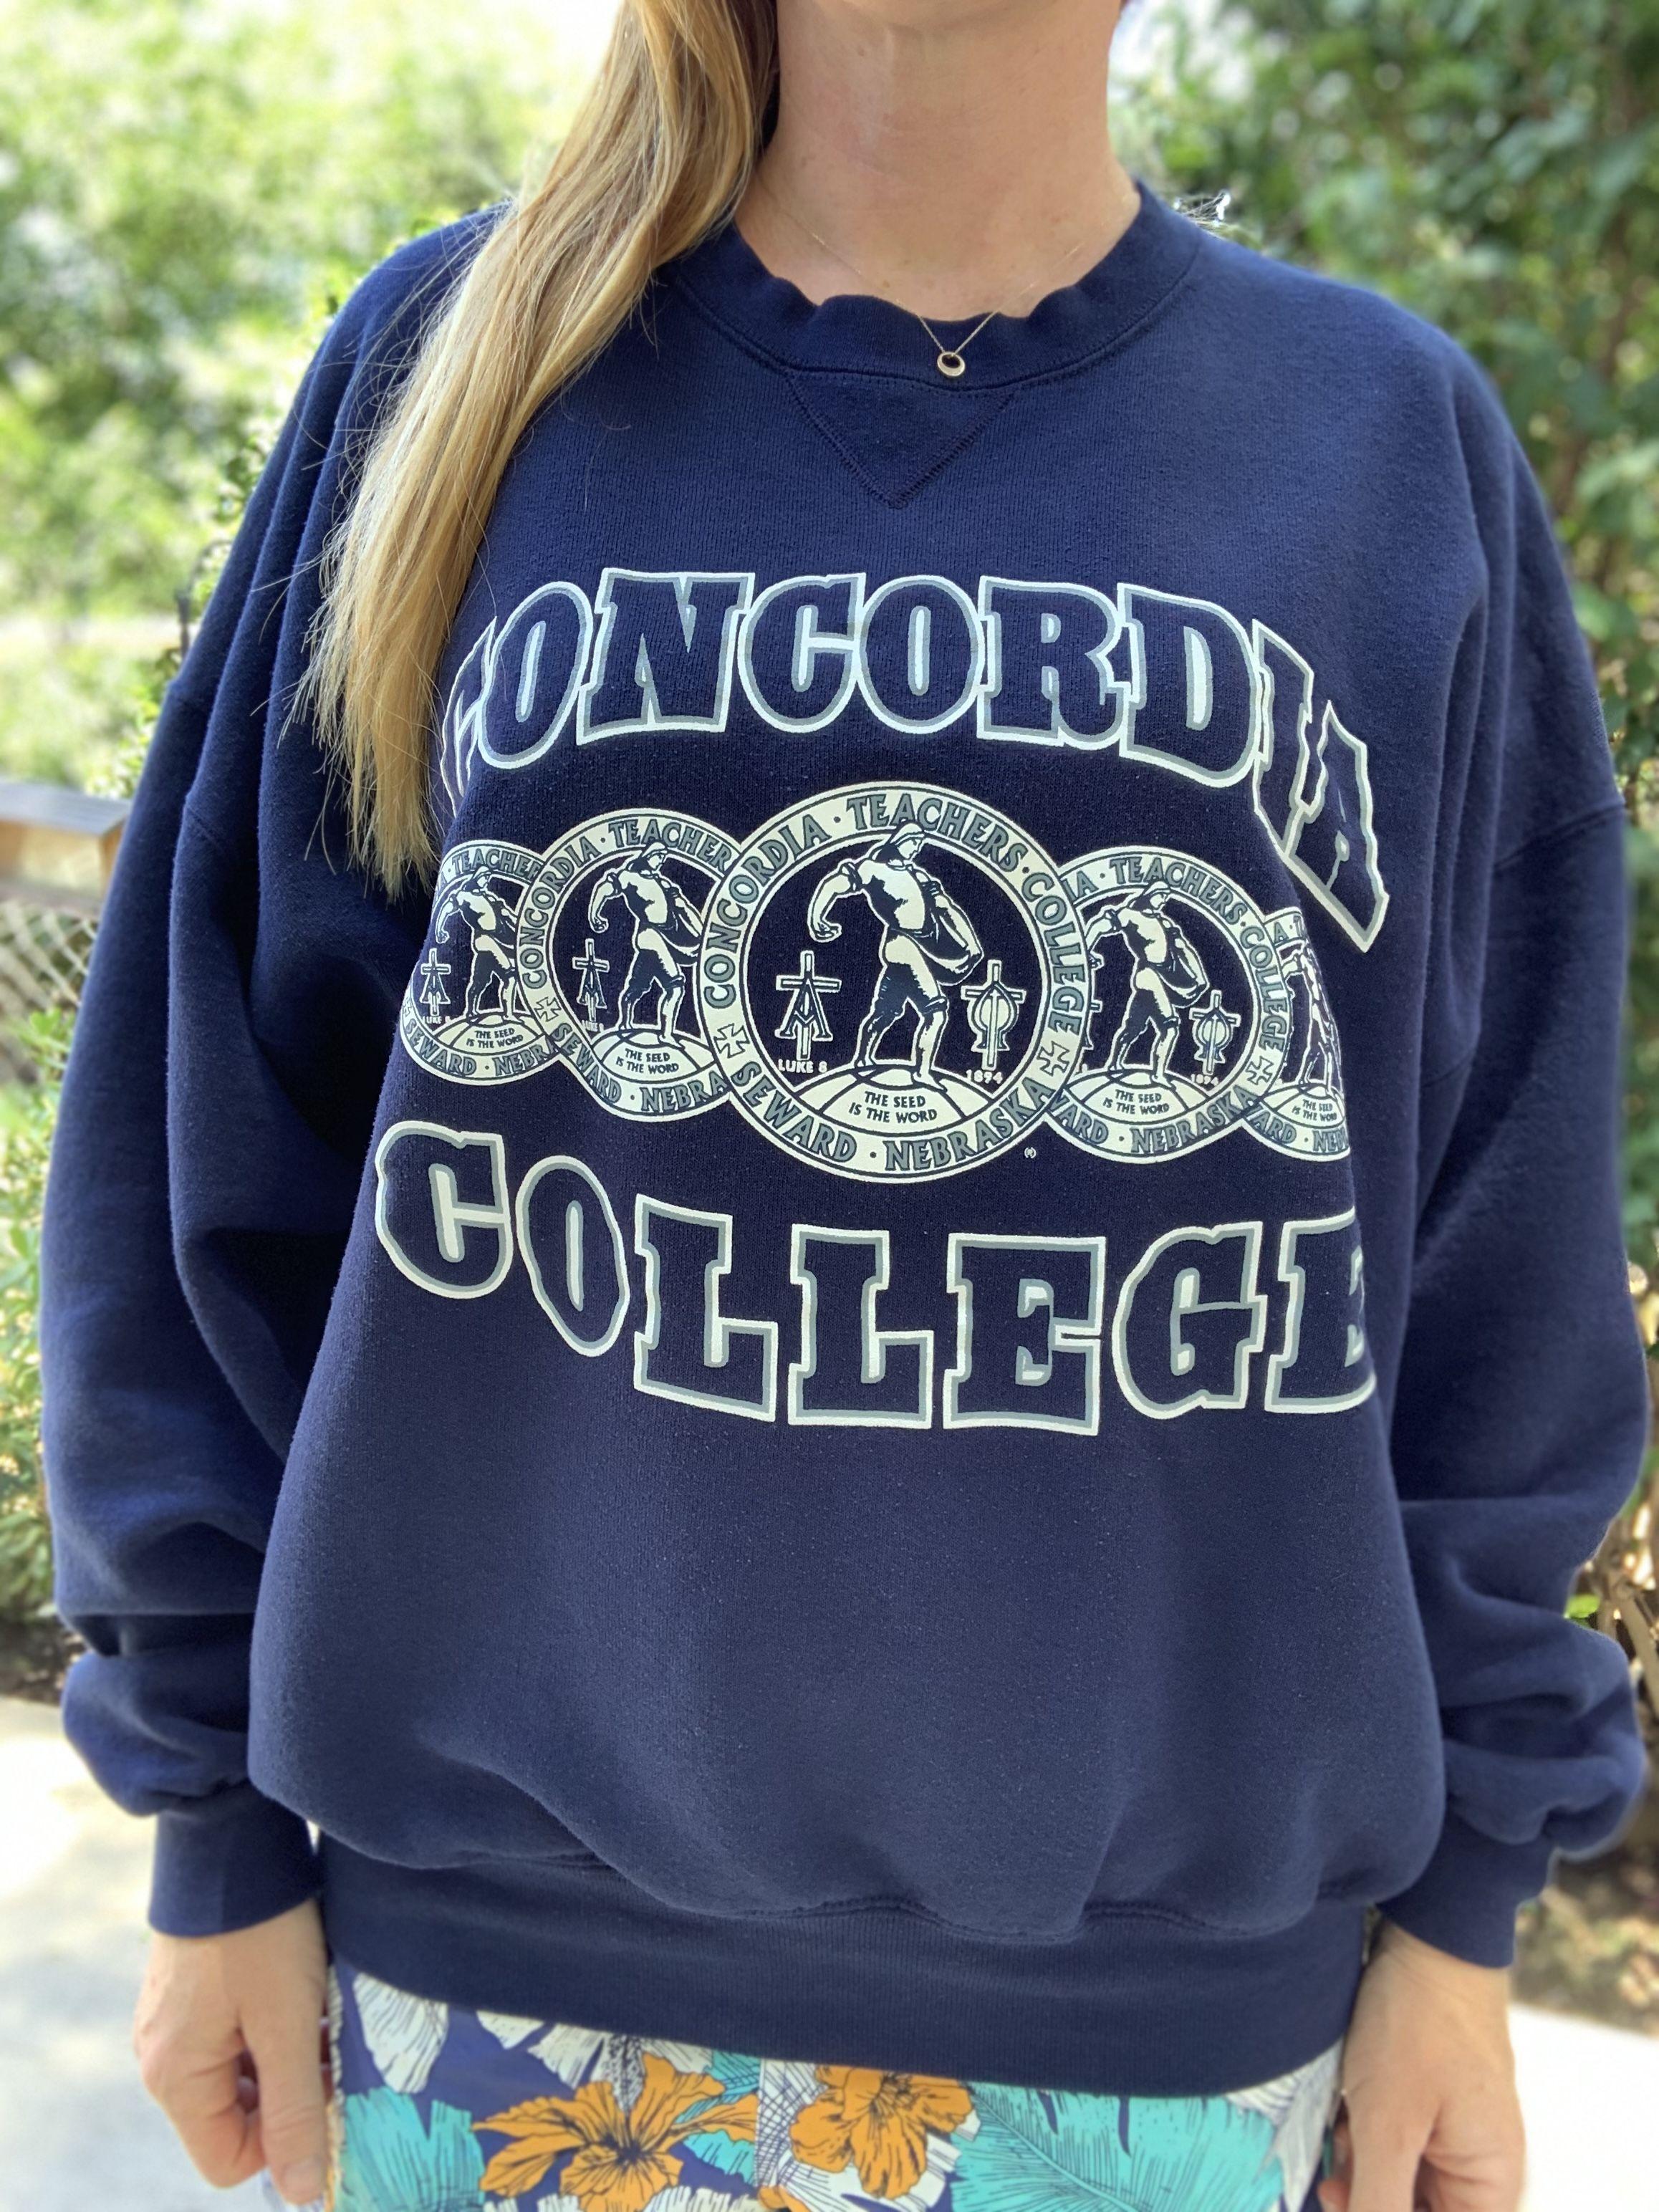 Vintage 1980s Sweatshirt Concordia College Crest Logo Size Etsy Vintage College Sweatshirts Sweatshirts Vintage Sweatshirt [ 3088 x 2316 Pixel ]